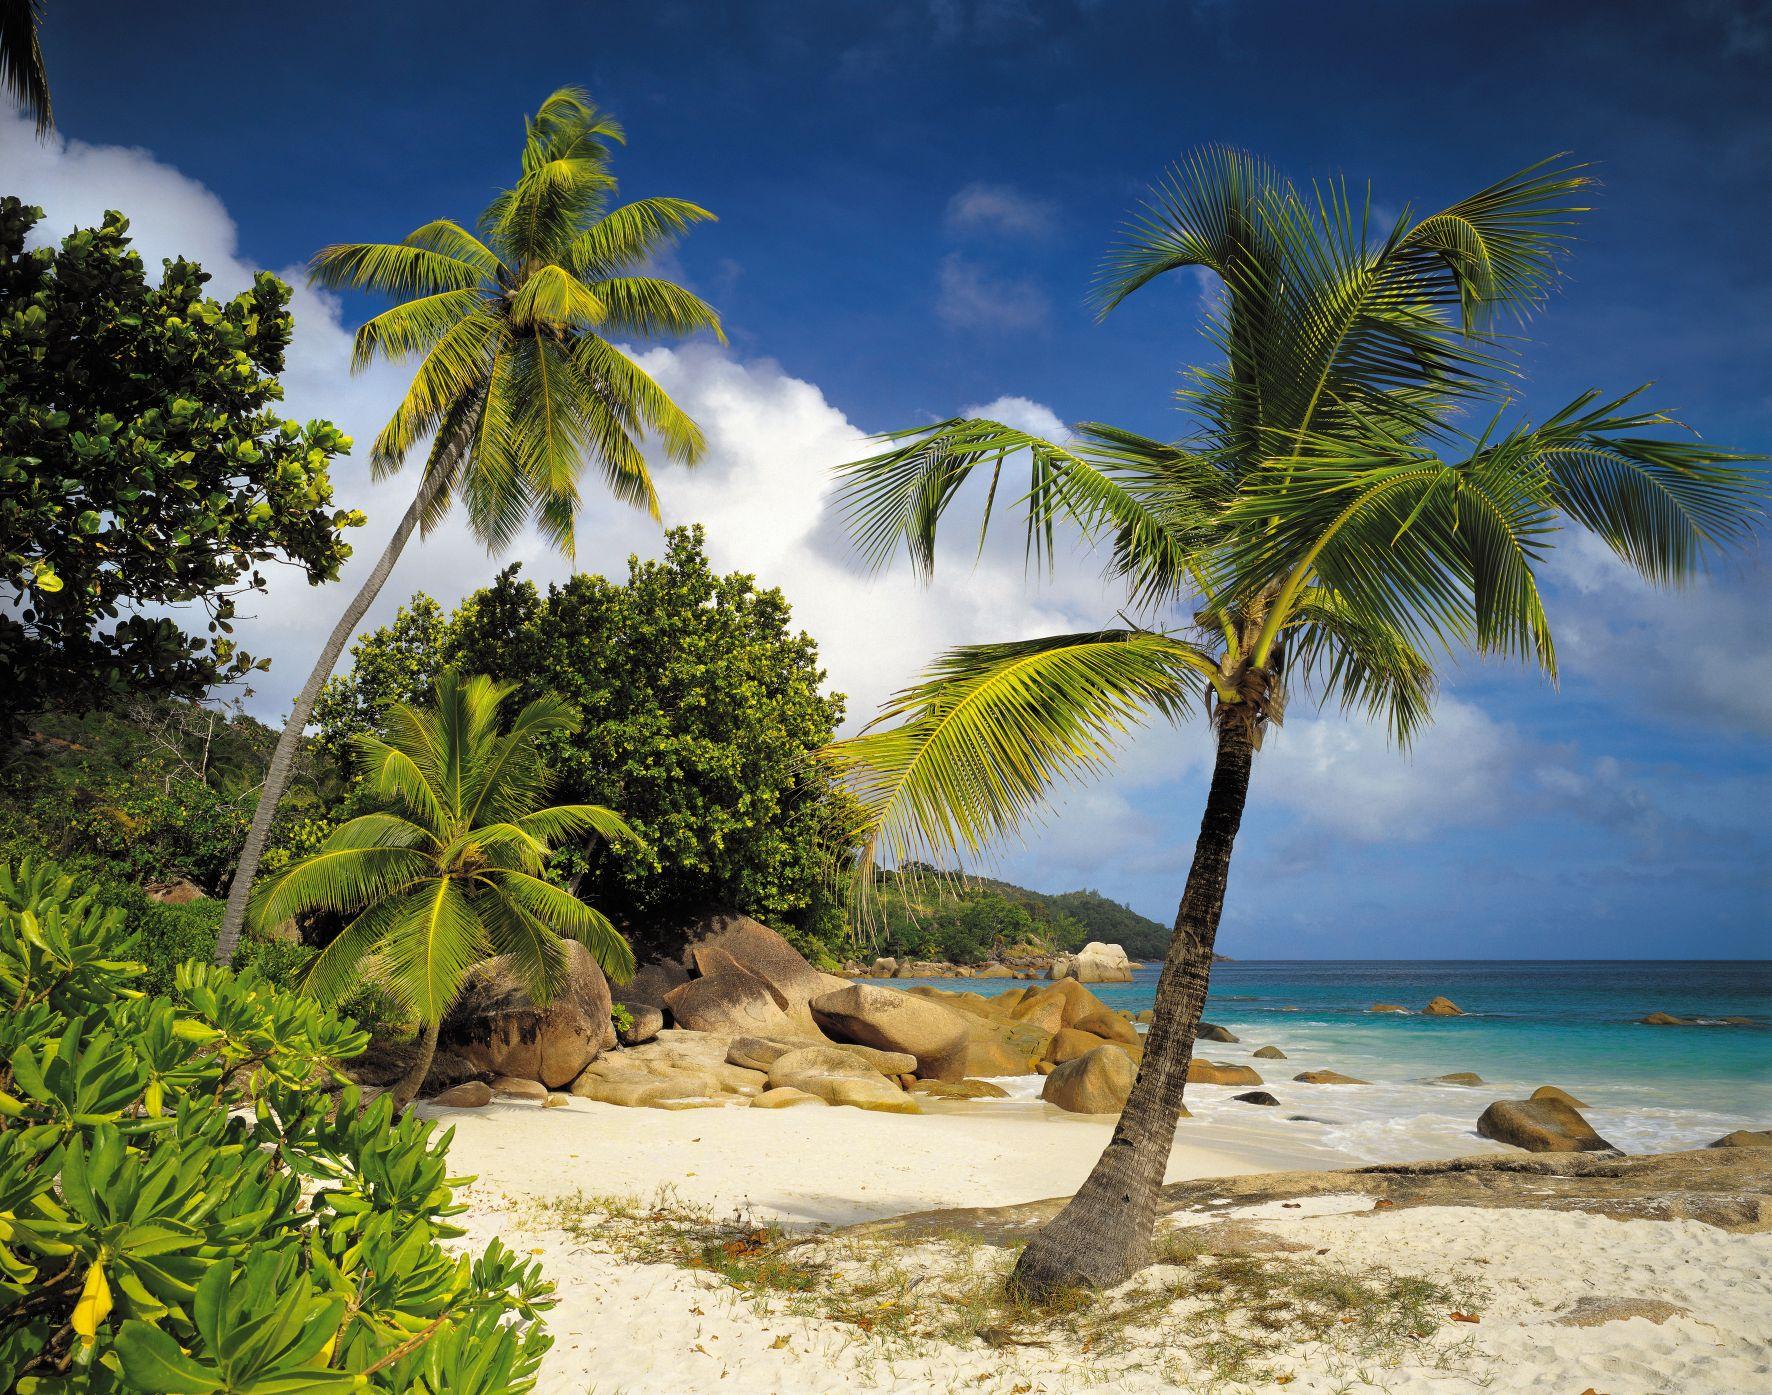 kiss fototapeten zu besten preisen fototapete praslin 368x254 palmenstrand seychellen. Black Bedroom Furniture Sets. Home Design Ideas